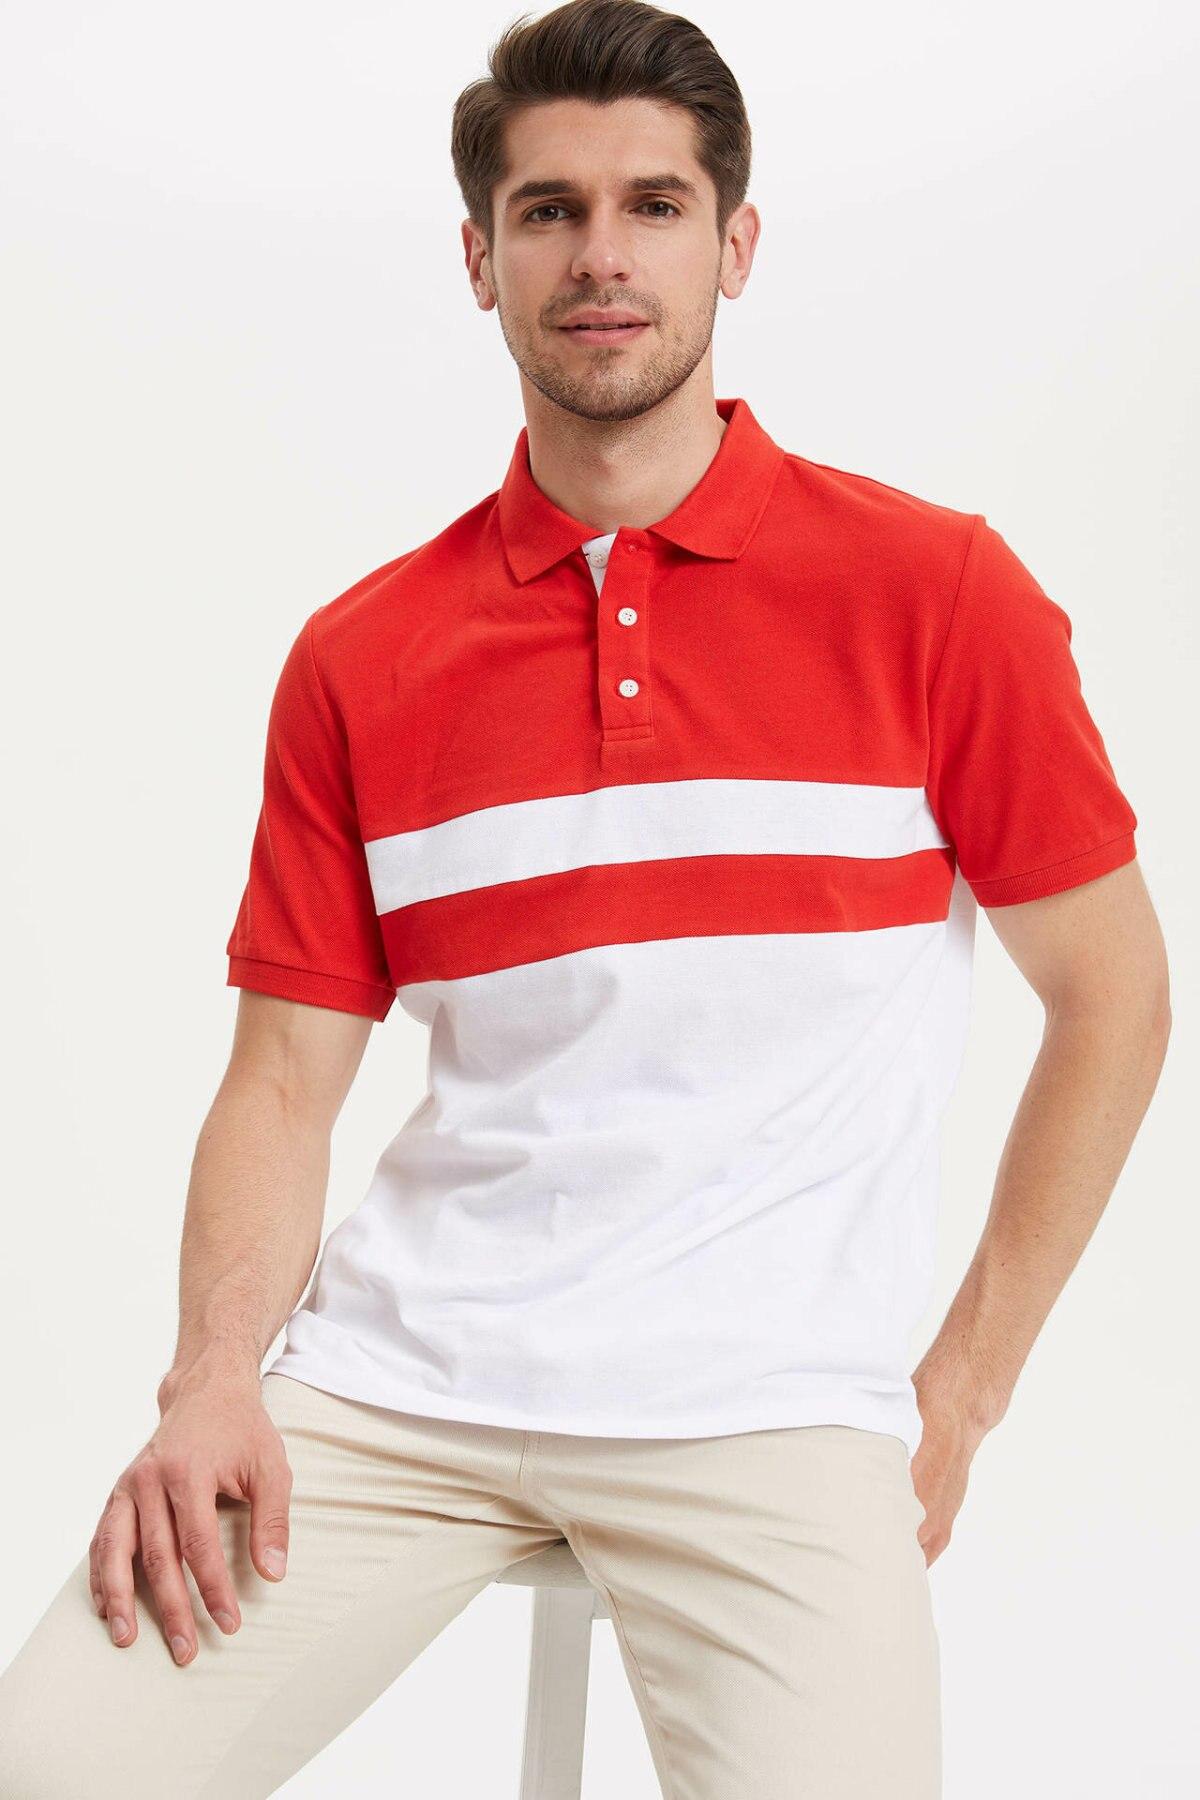 DeFacto Man Fashion Polo Shirt Casual Fashion Patchwork Striped Short Sleeve High Quality Polo Shirt New -L4977AZ19SM